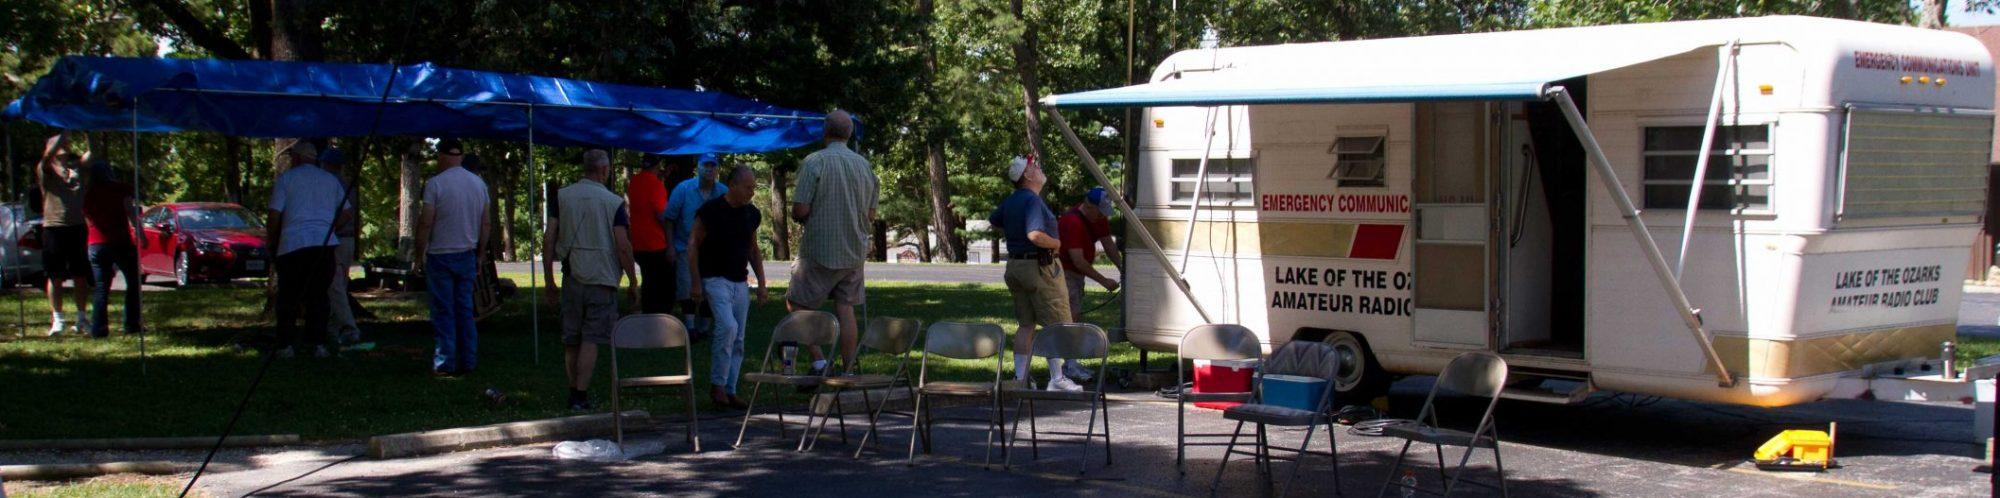 Lake of the Ozarks Amateur Radio Club (LOARC) – I